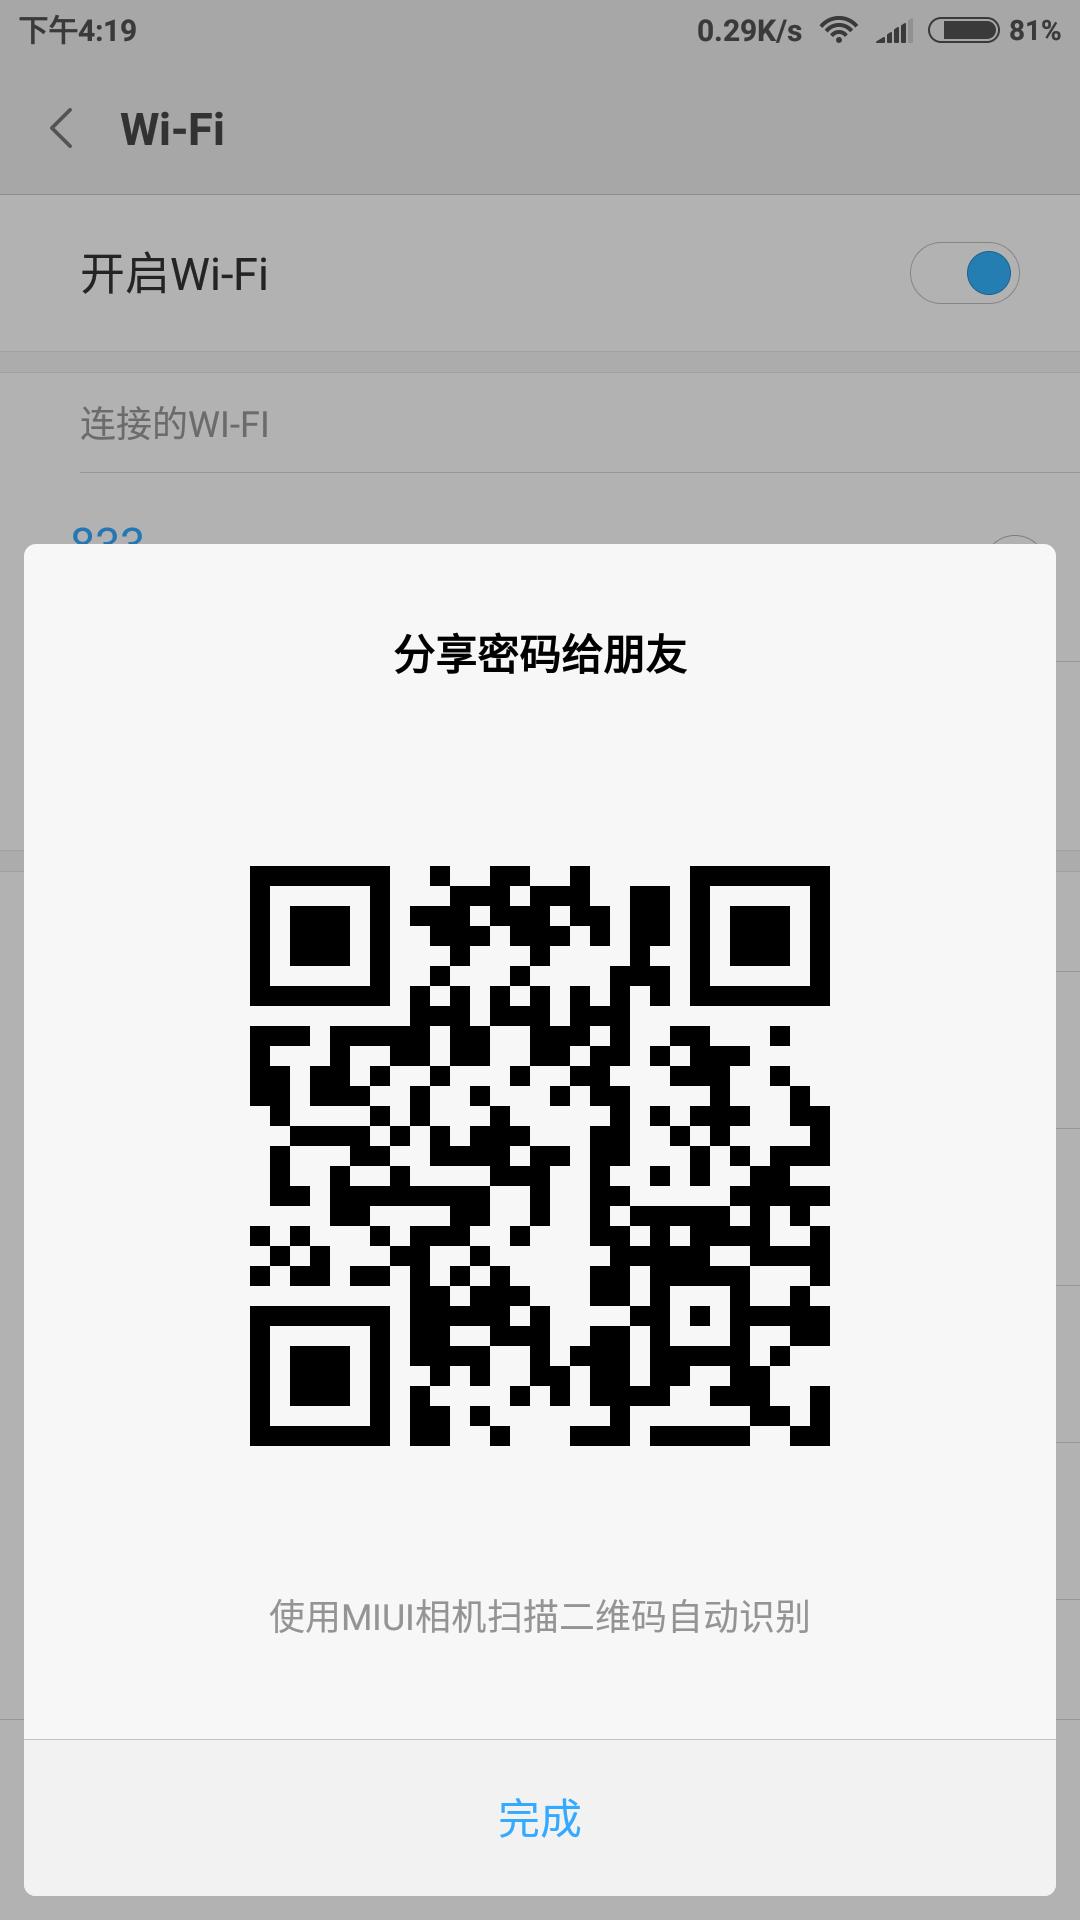 Screenshot_2016-10-22-16-19-43-113_com.android.se.png